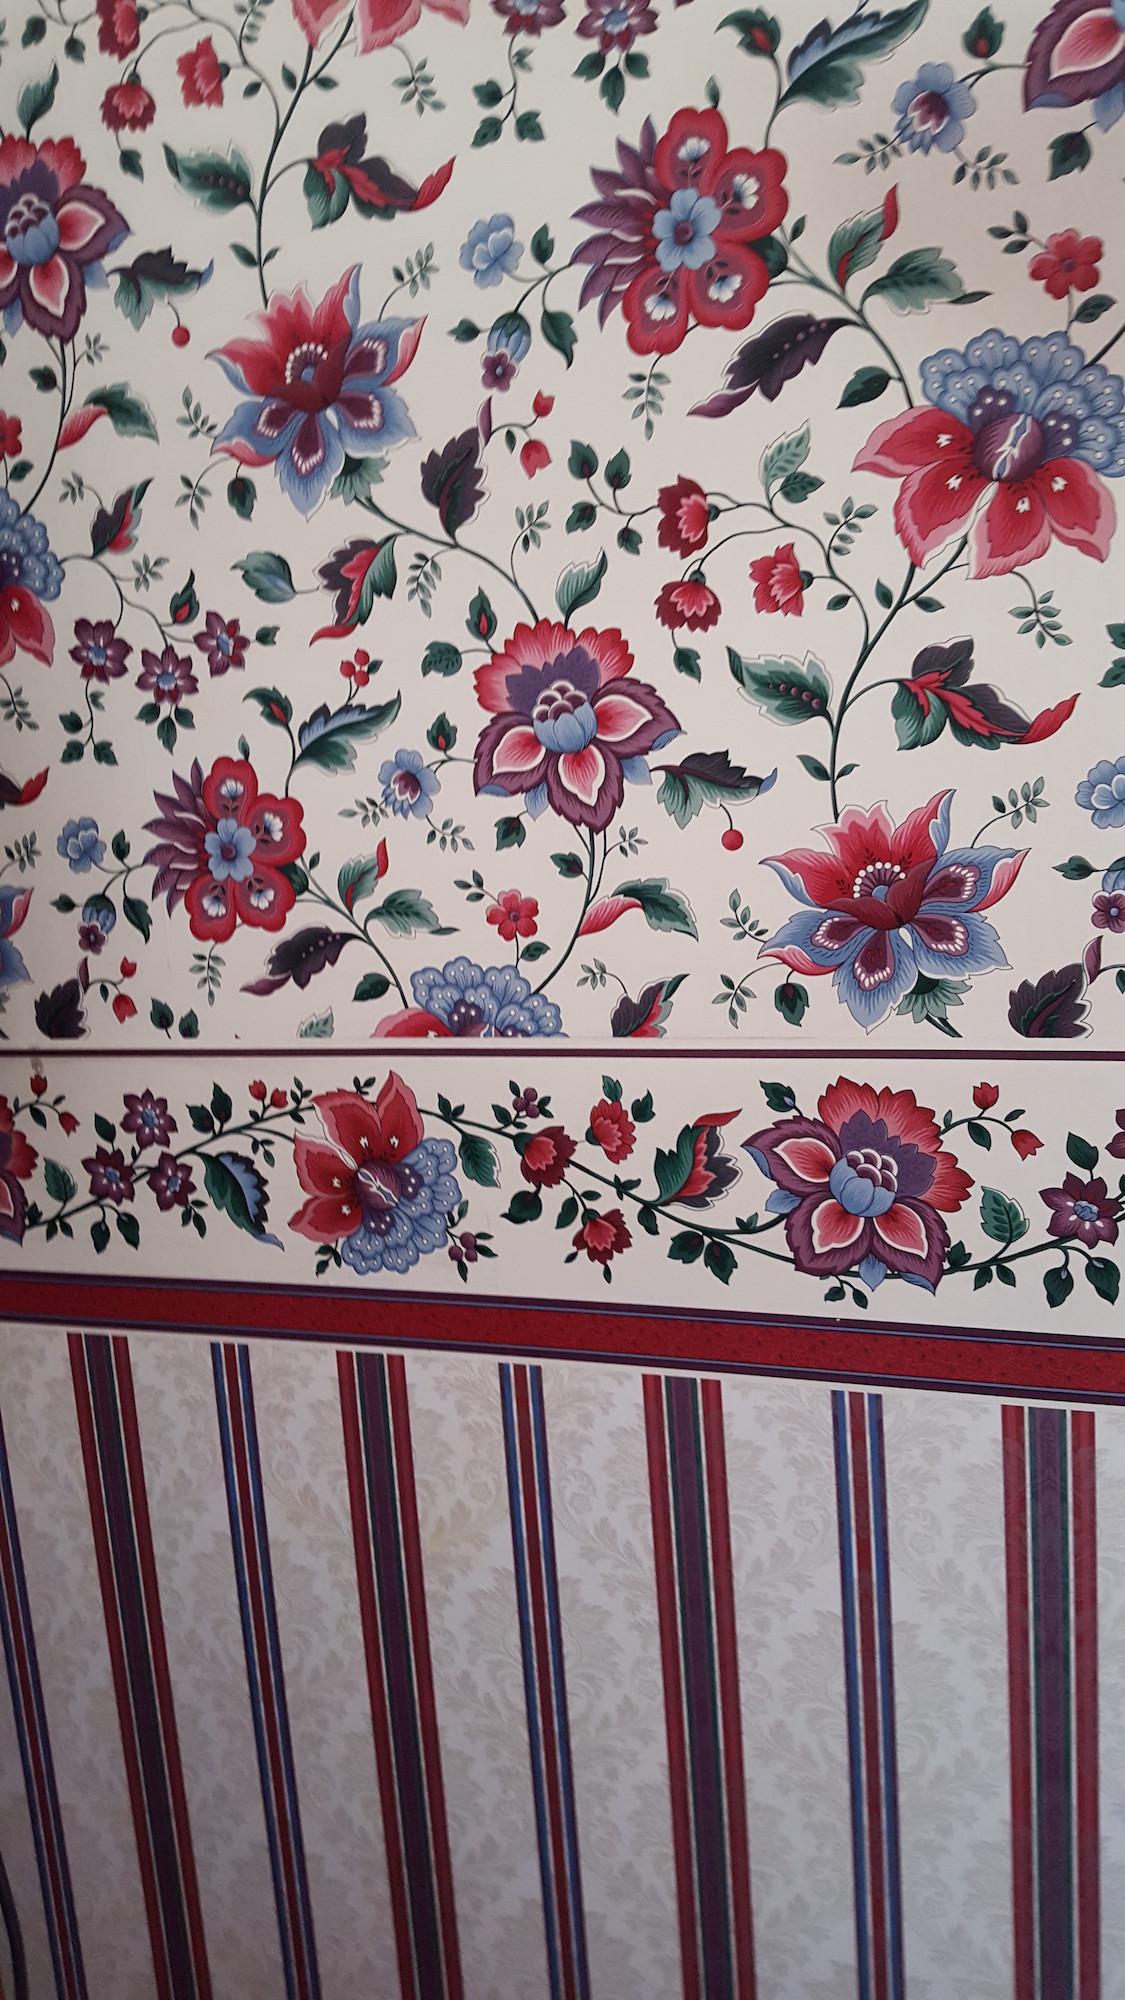 Wallpaper as wainscoting